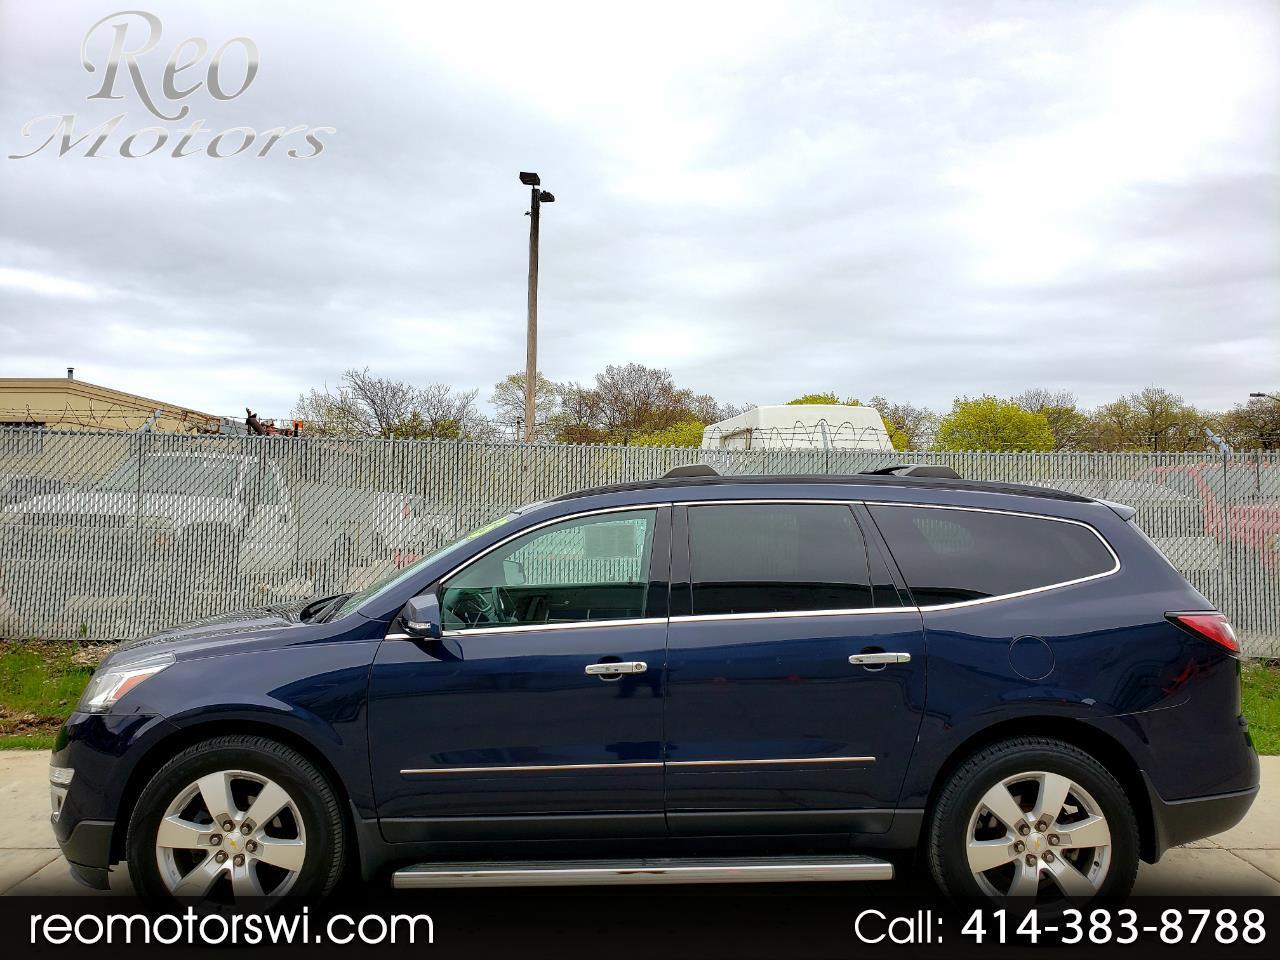 2015 Chevrolet Traverse LTZ AWD